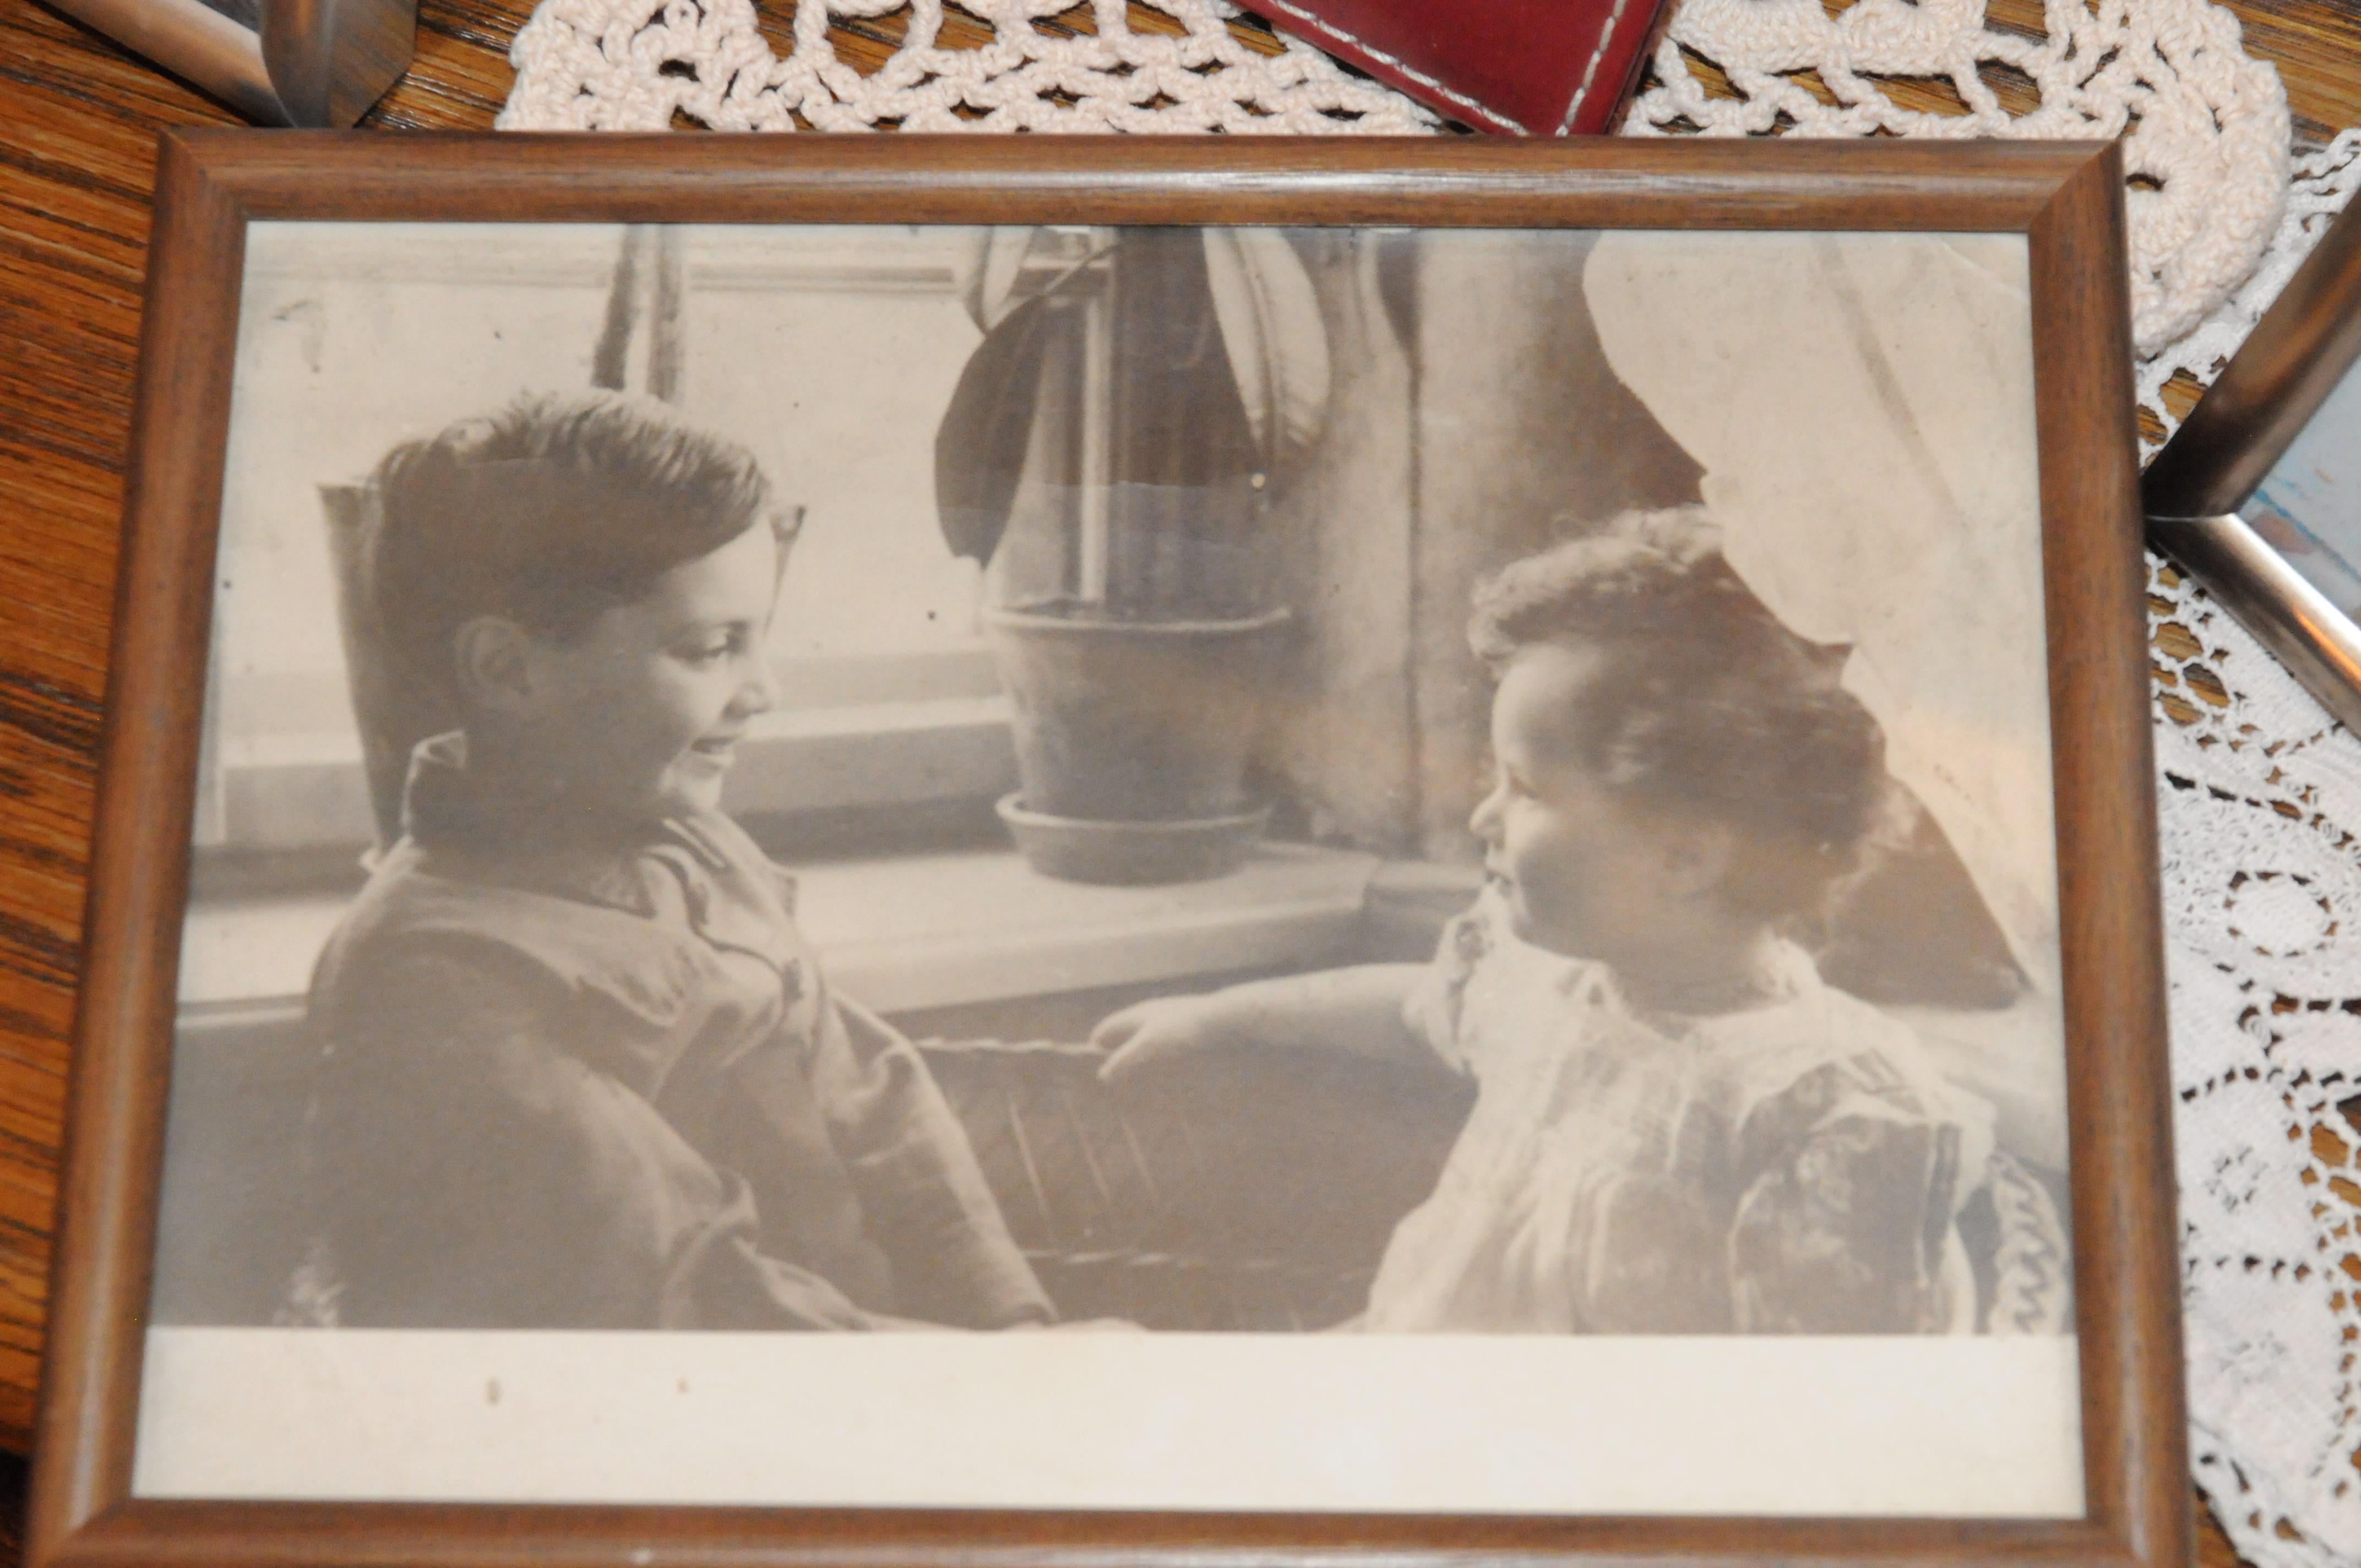 Tamar Dreifuss überlebte als fünfjährige den Holocaust. Foto: Lena Heising